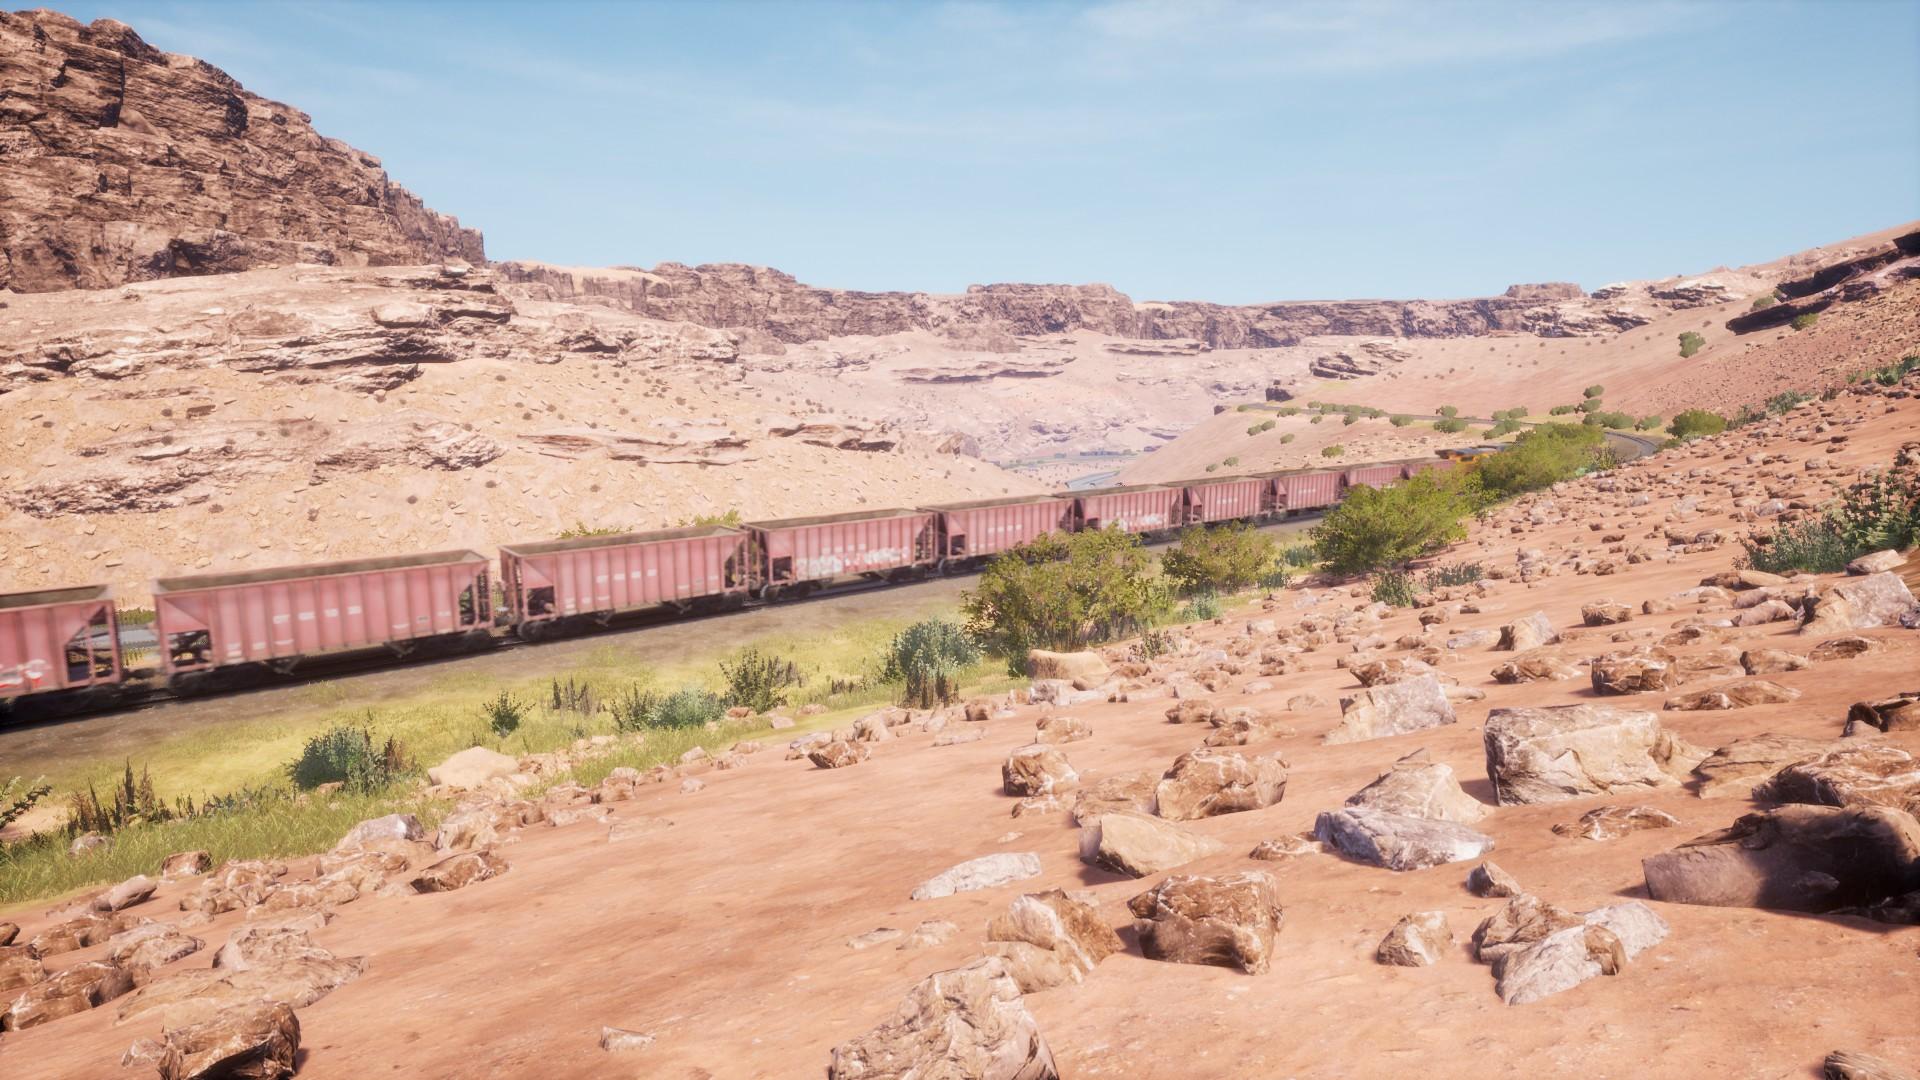 Train Sim World 2 Cane Creek Through The Canyons